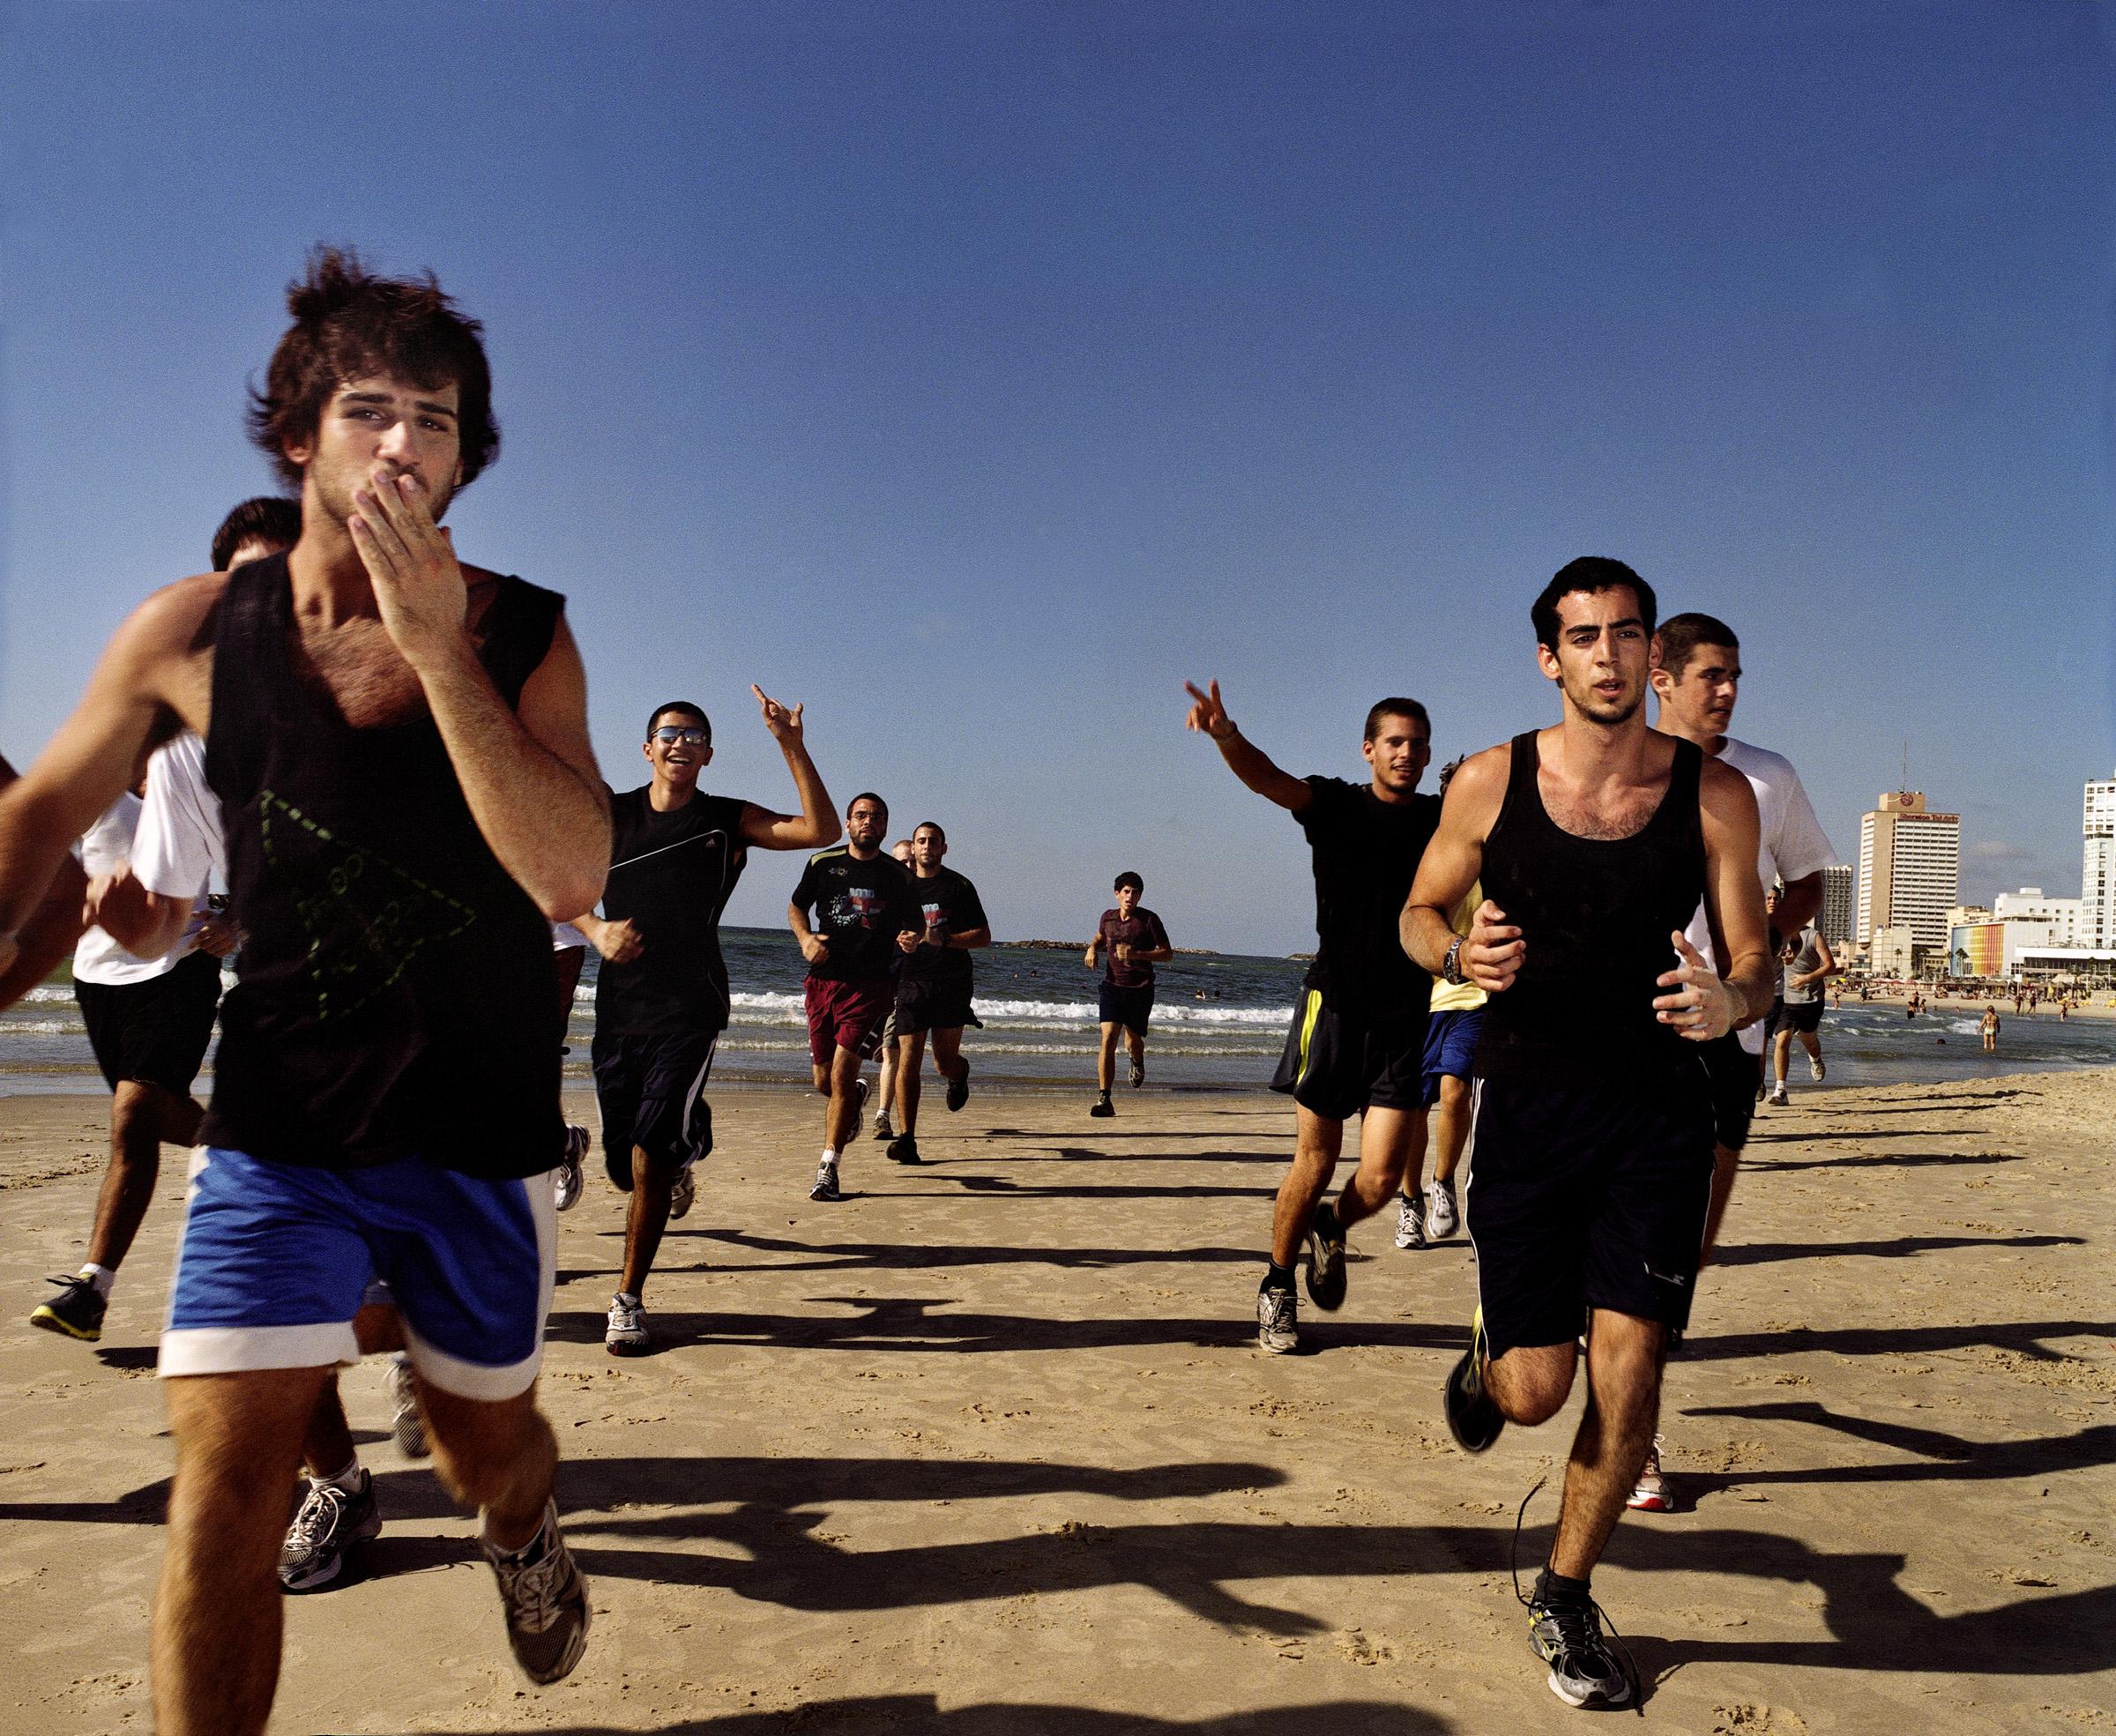 Basic Training, 2010   Israeli teenage boys get in shape as part their pre-military training.